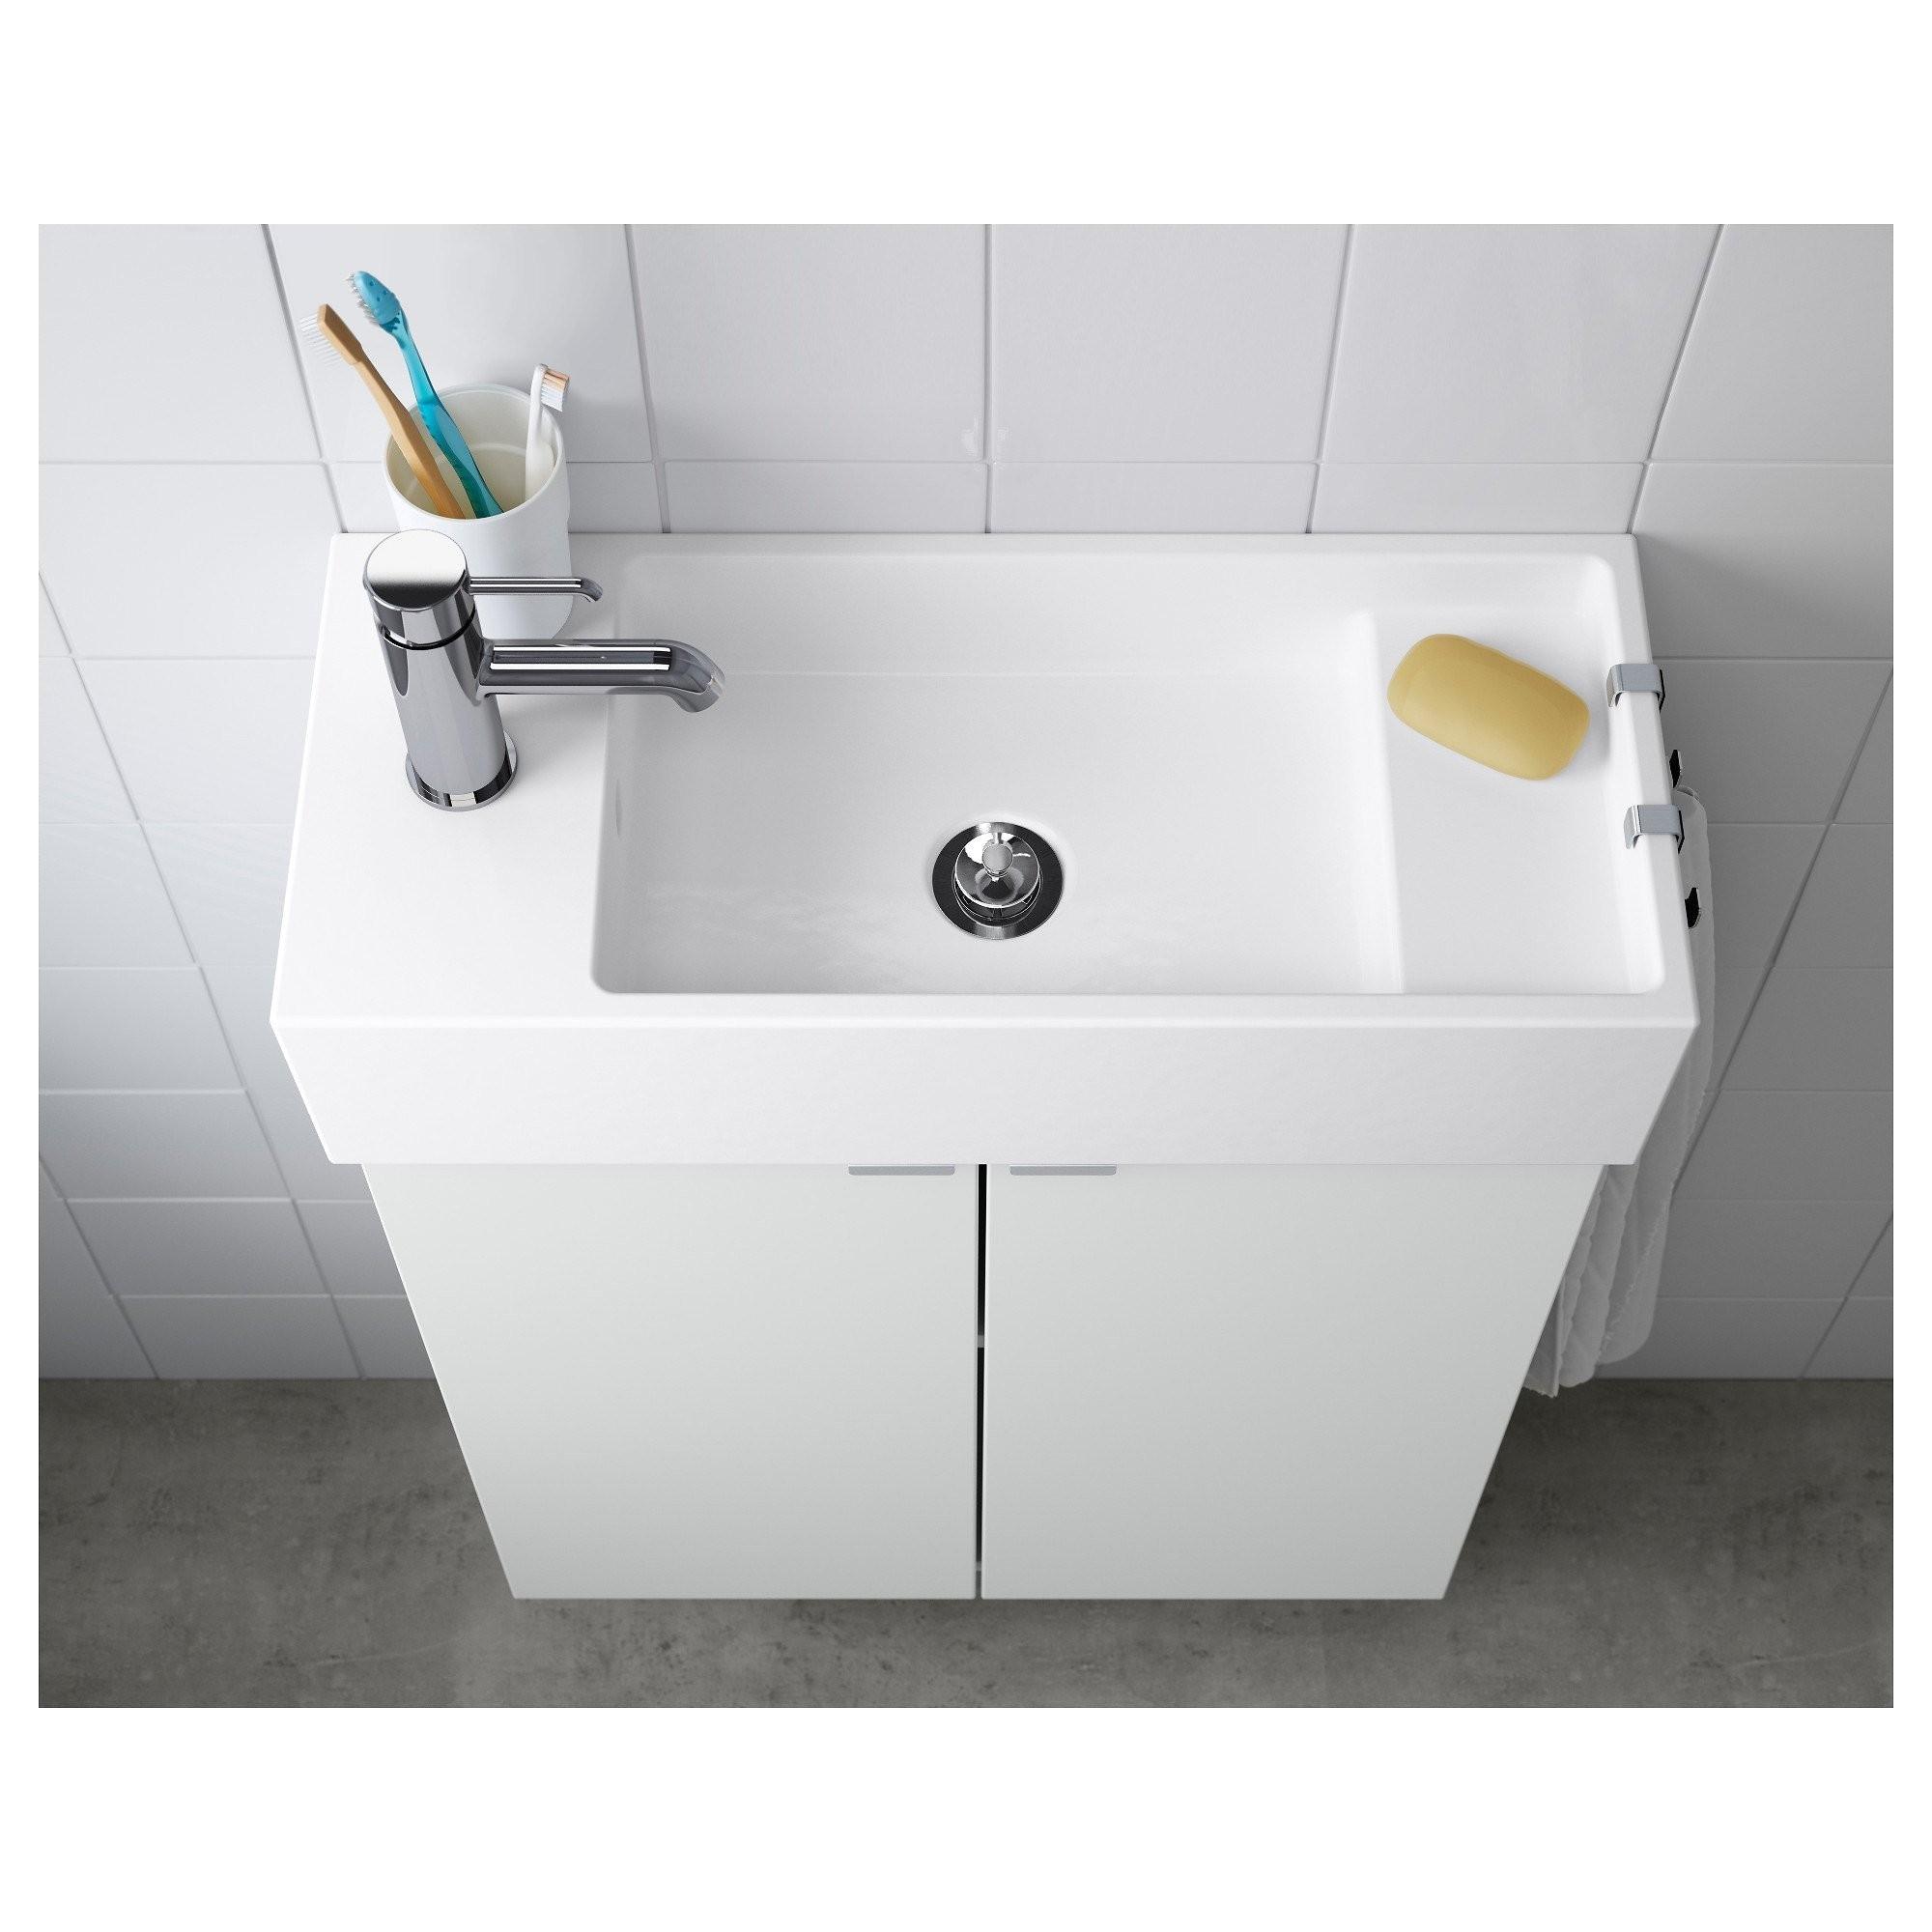 Lowes Complete Home Decorating Bathroom 34 Bathroom Vanity Lights ...